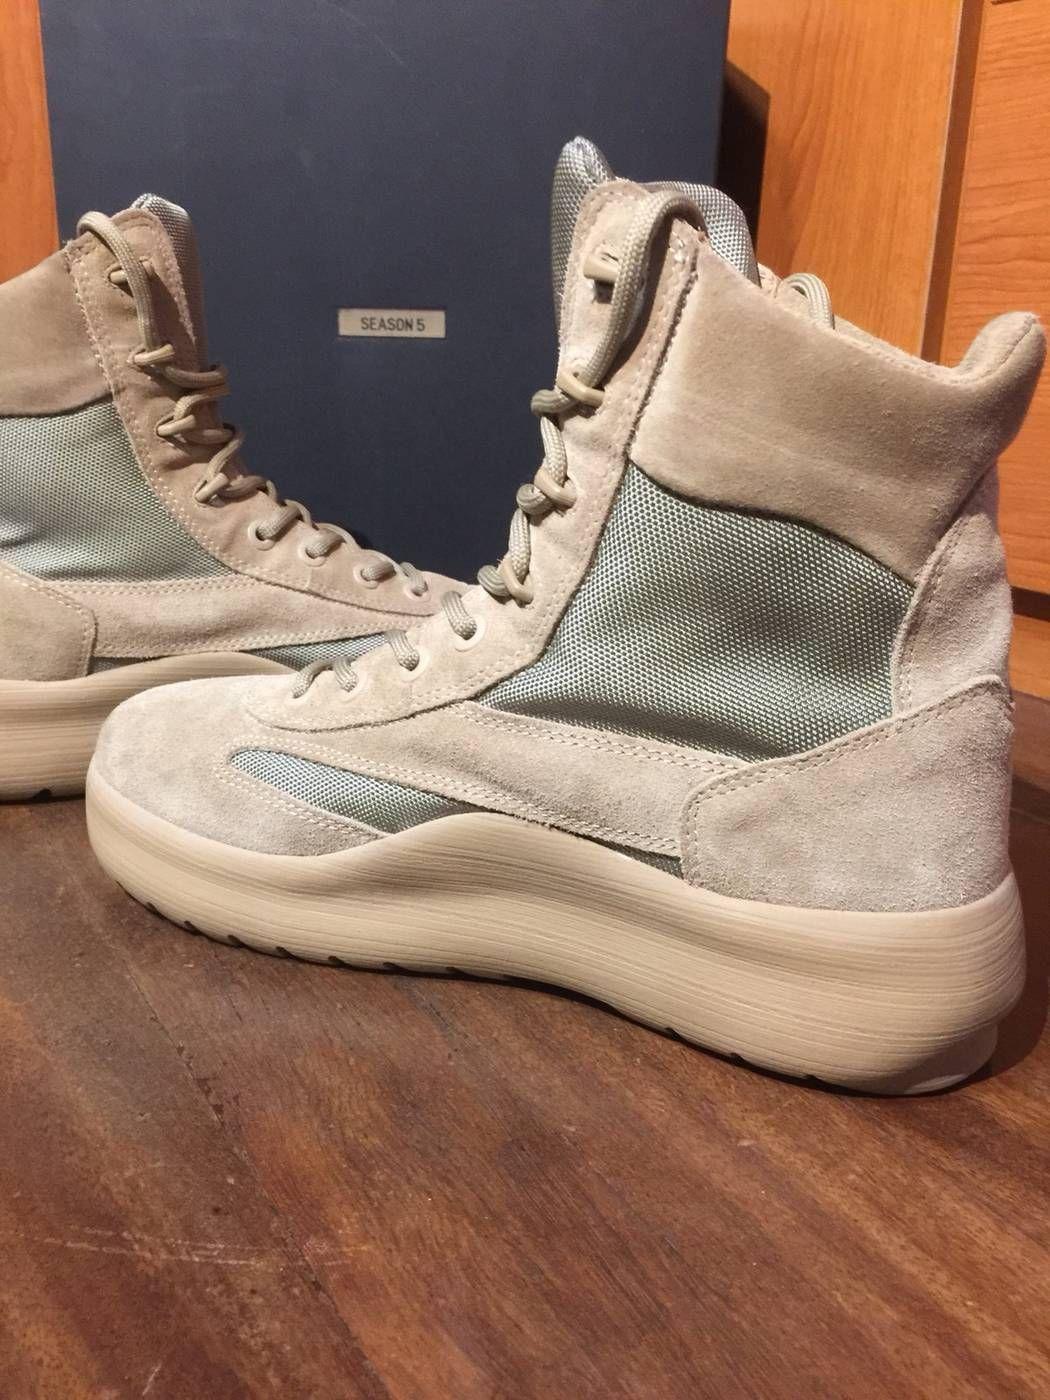 3960ffef2b132 Kanye West Yeezy Season 5 Military Suede Boots Size US 10   EU 43 - 4